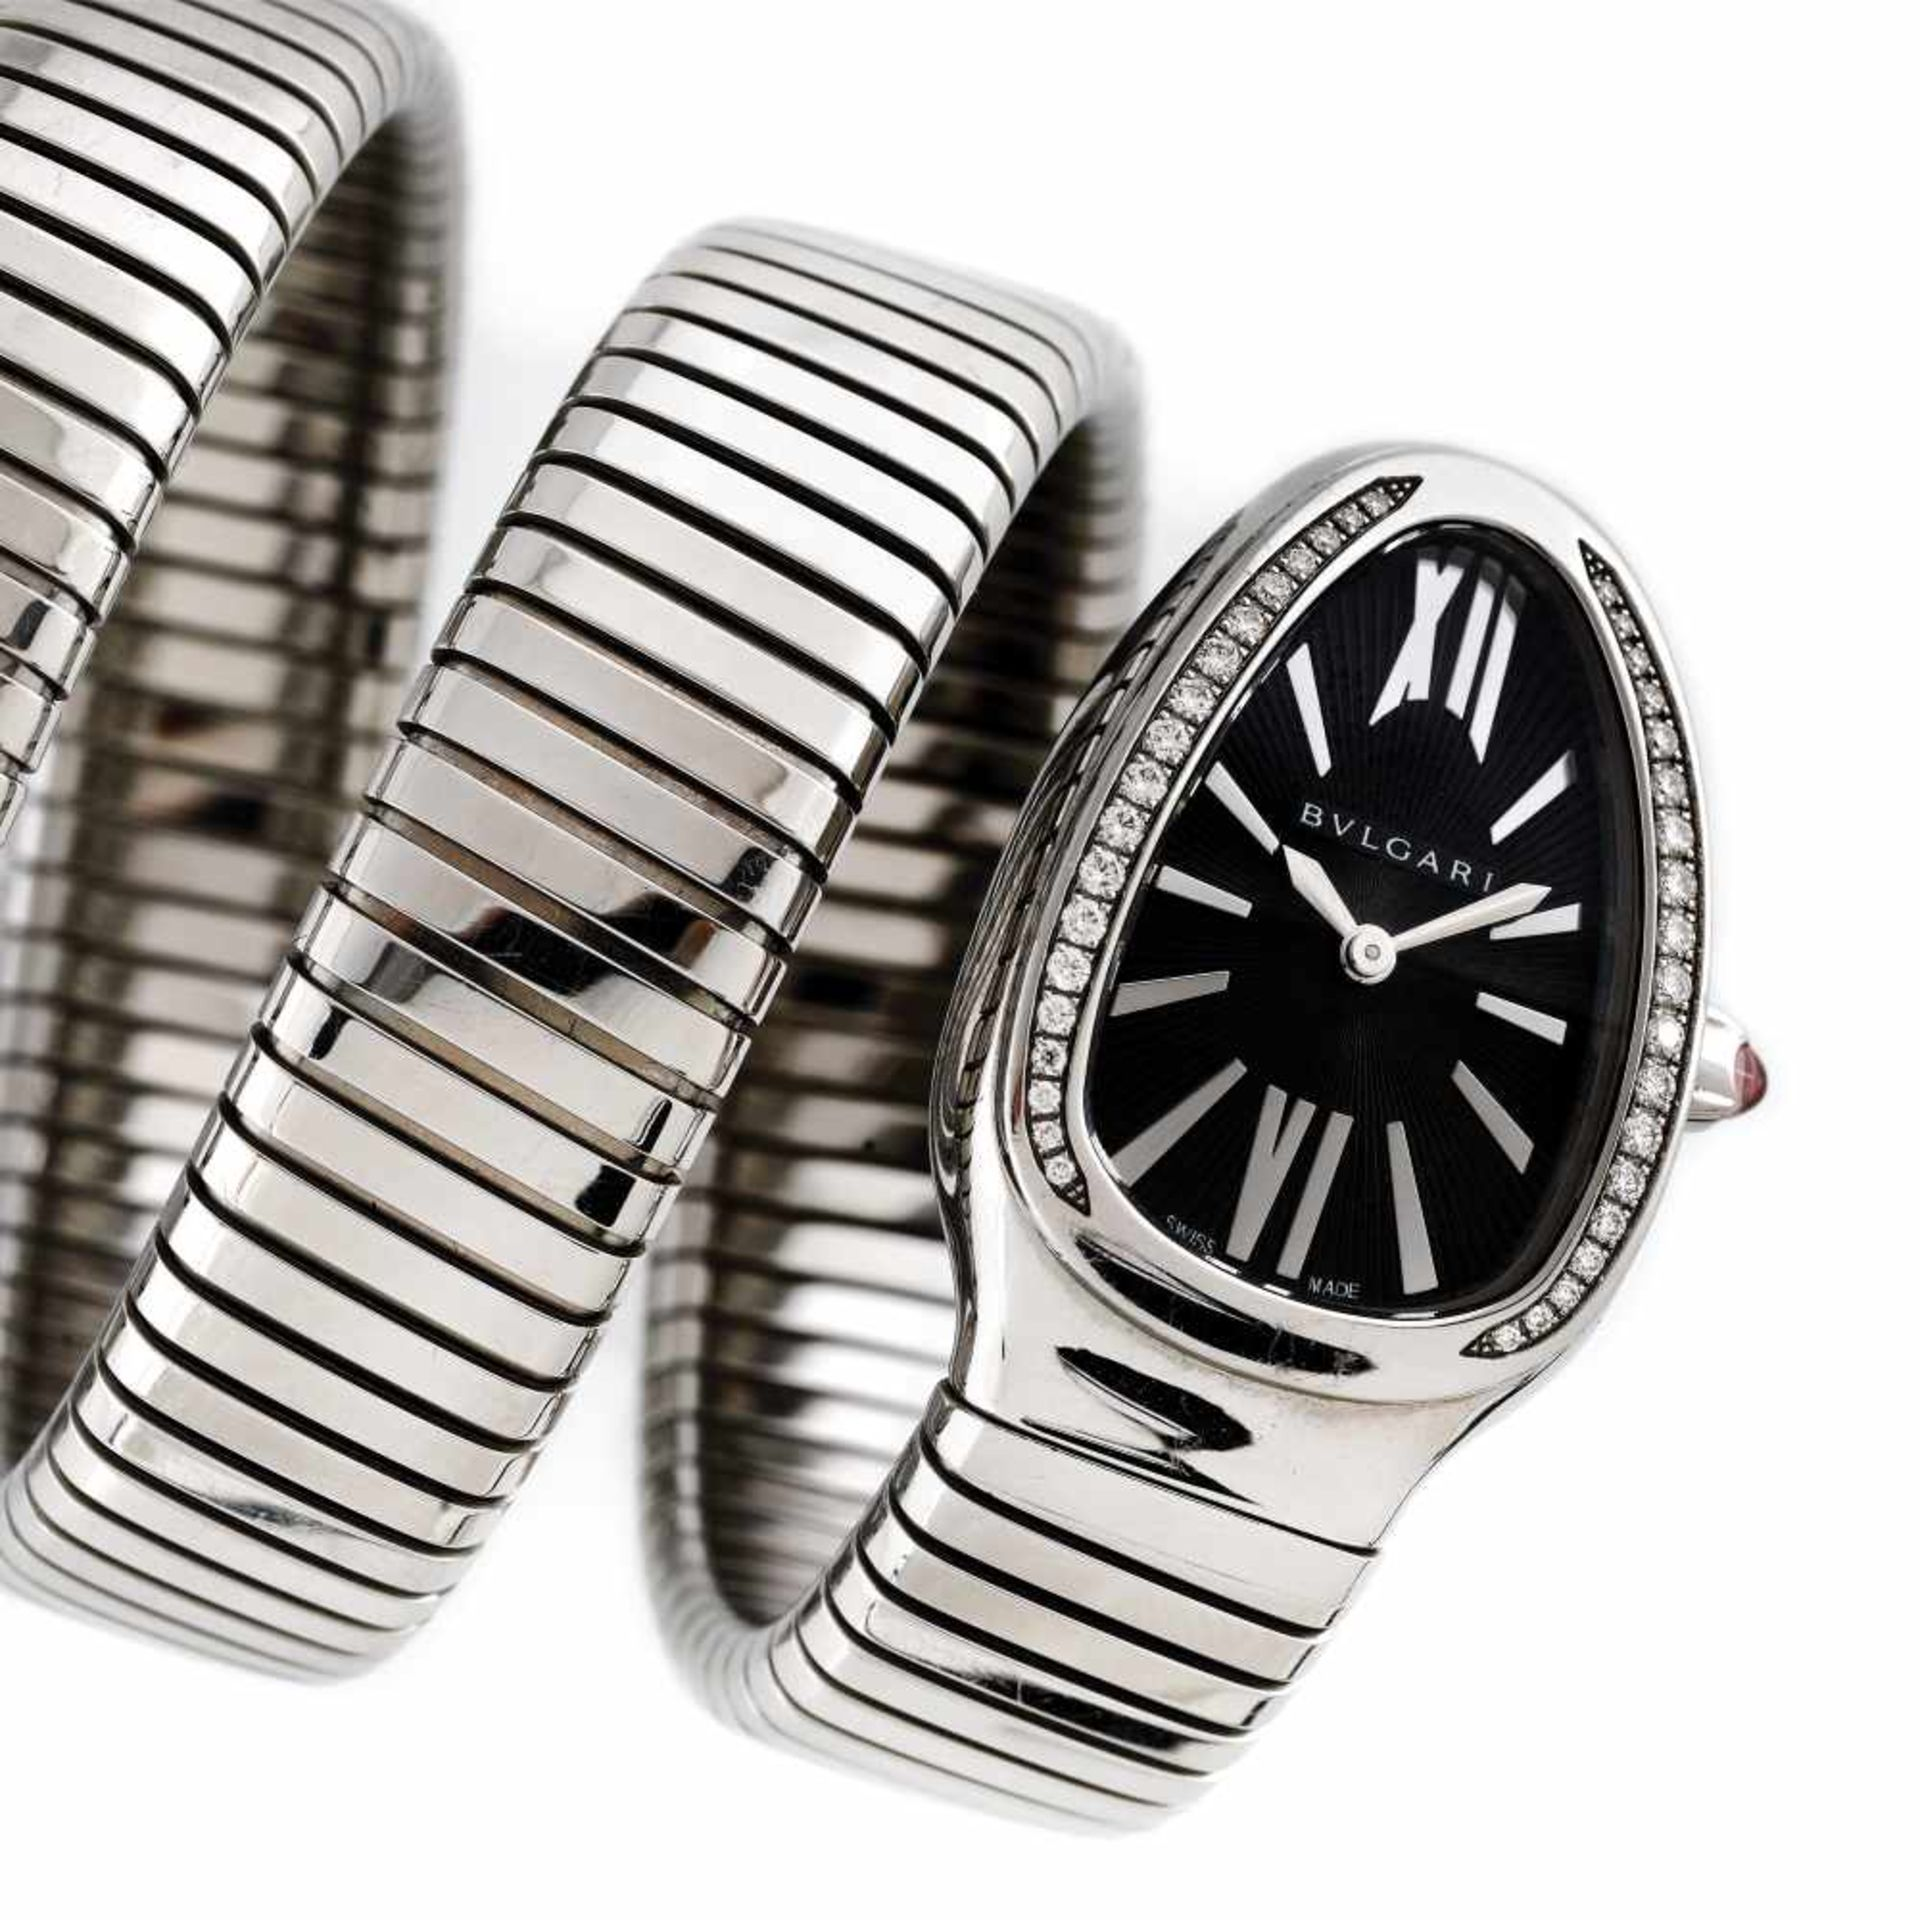 Bvlgari Serpenti Tubogas bracelet watch, women, decorated with diamonds, provenance documents - Bild 2 aus 5